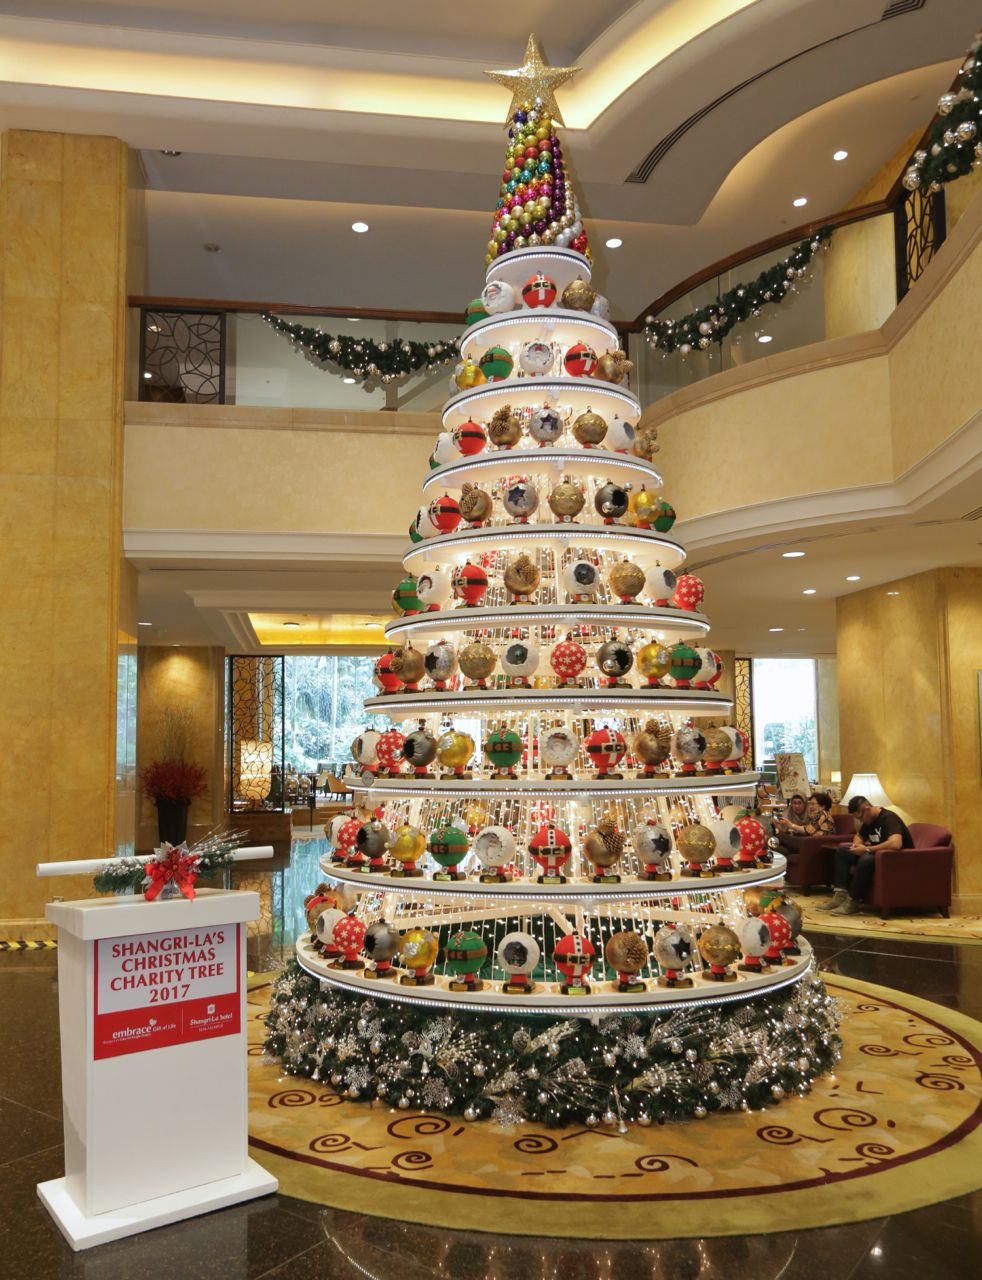 The Glittering Baubles of Life' Christmas Charity Tree 2017 in the main lobby of Shangri-La Hotel Kuala Lumpur